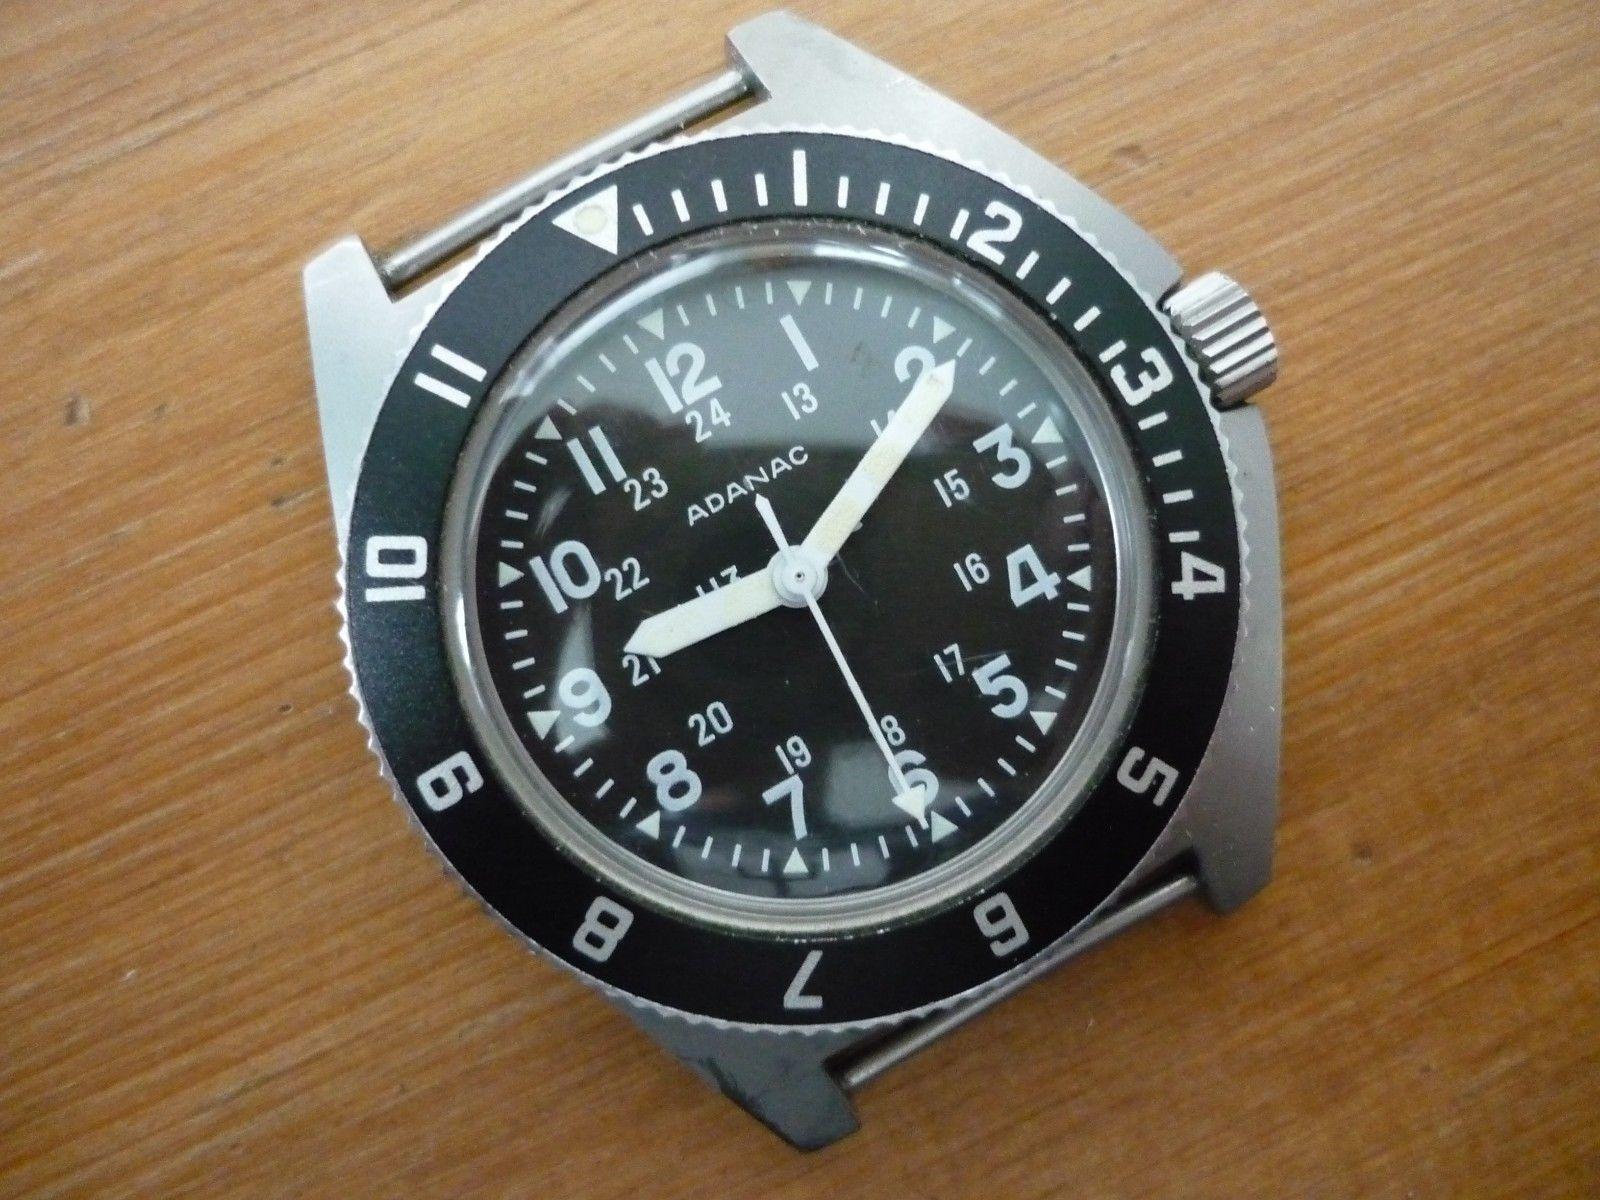 Adanac Military Diver/Navigator's Watch